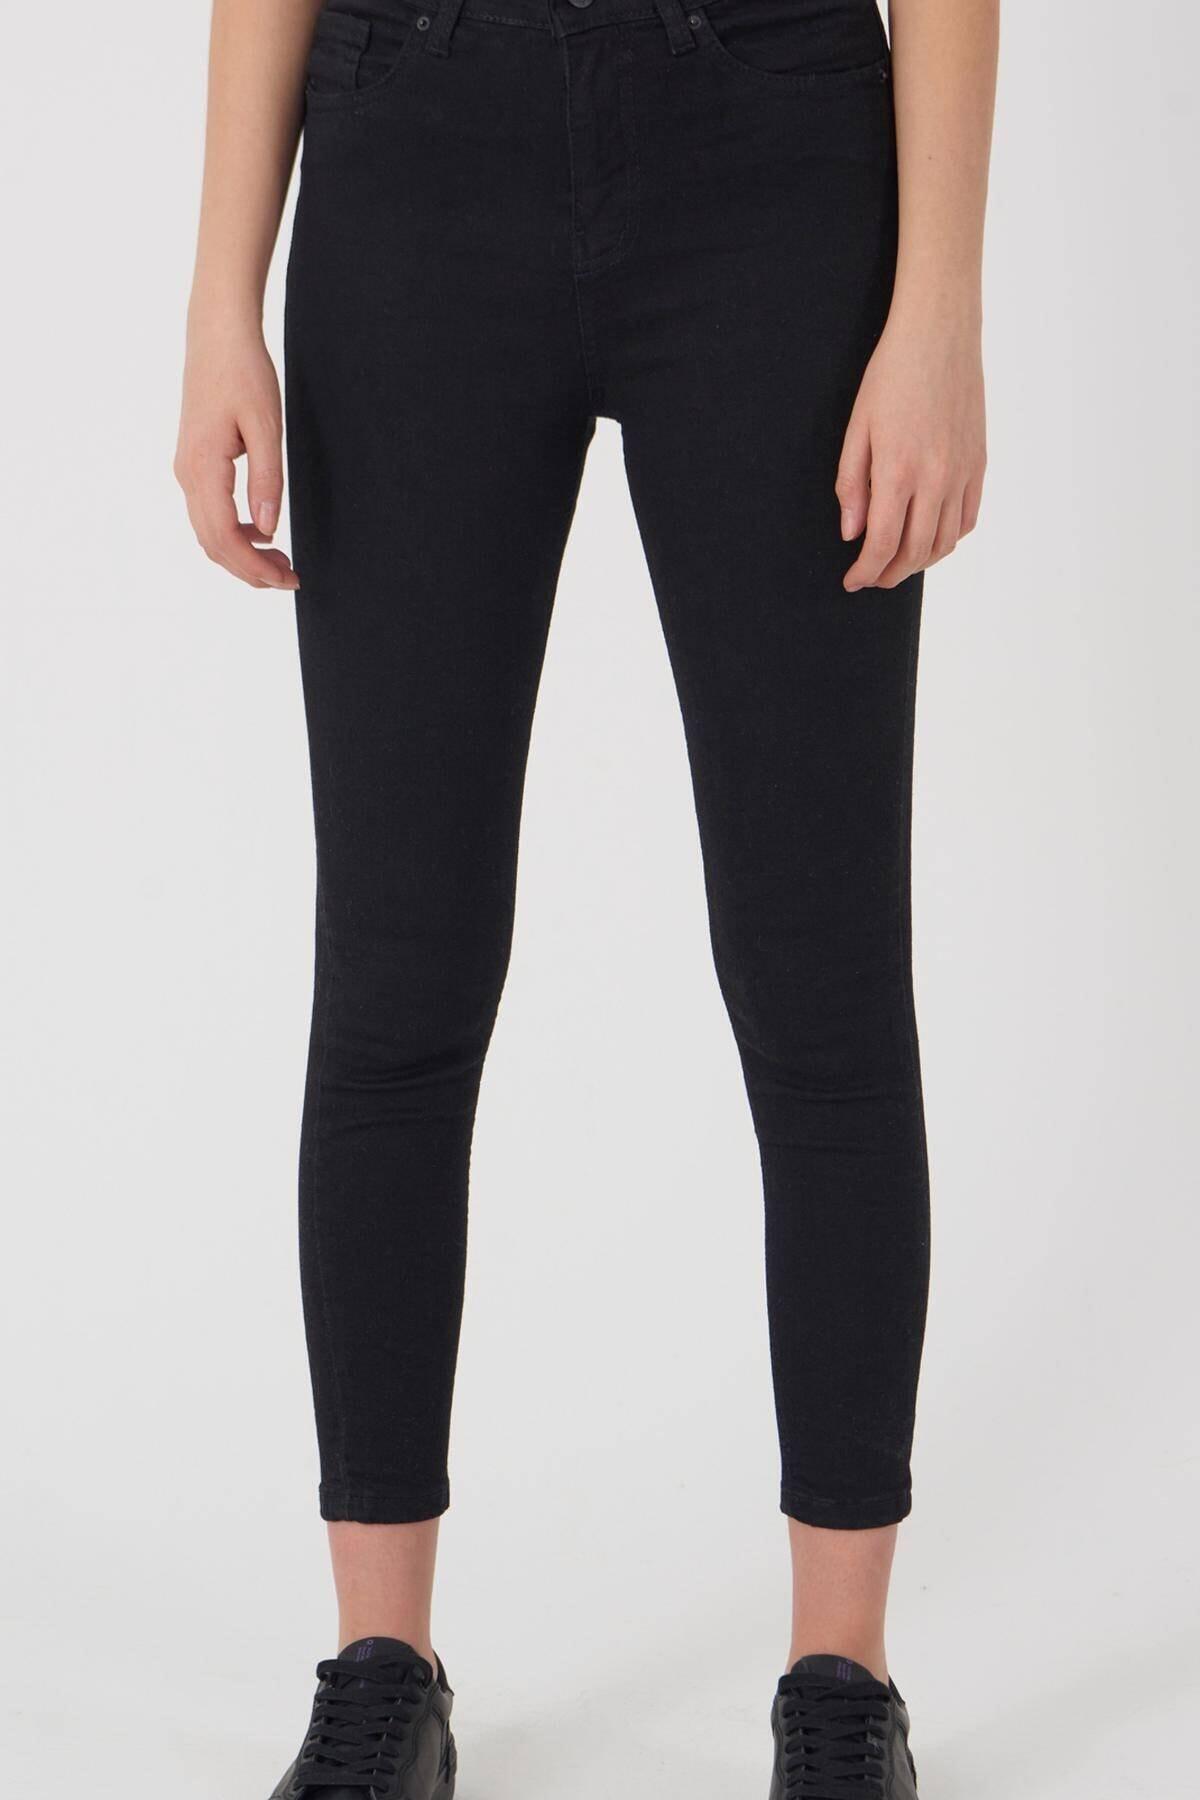 Addax Kadın Siyah Yüksek Bel Pantolon Pn8560 - Pnspnt Adx-0000014371 2